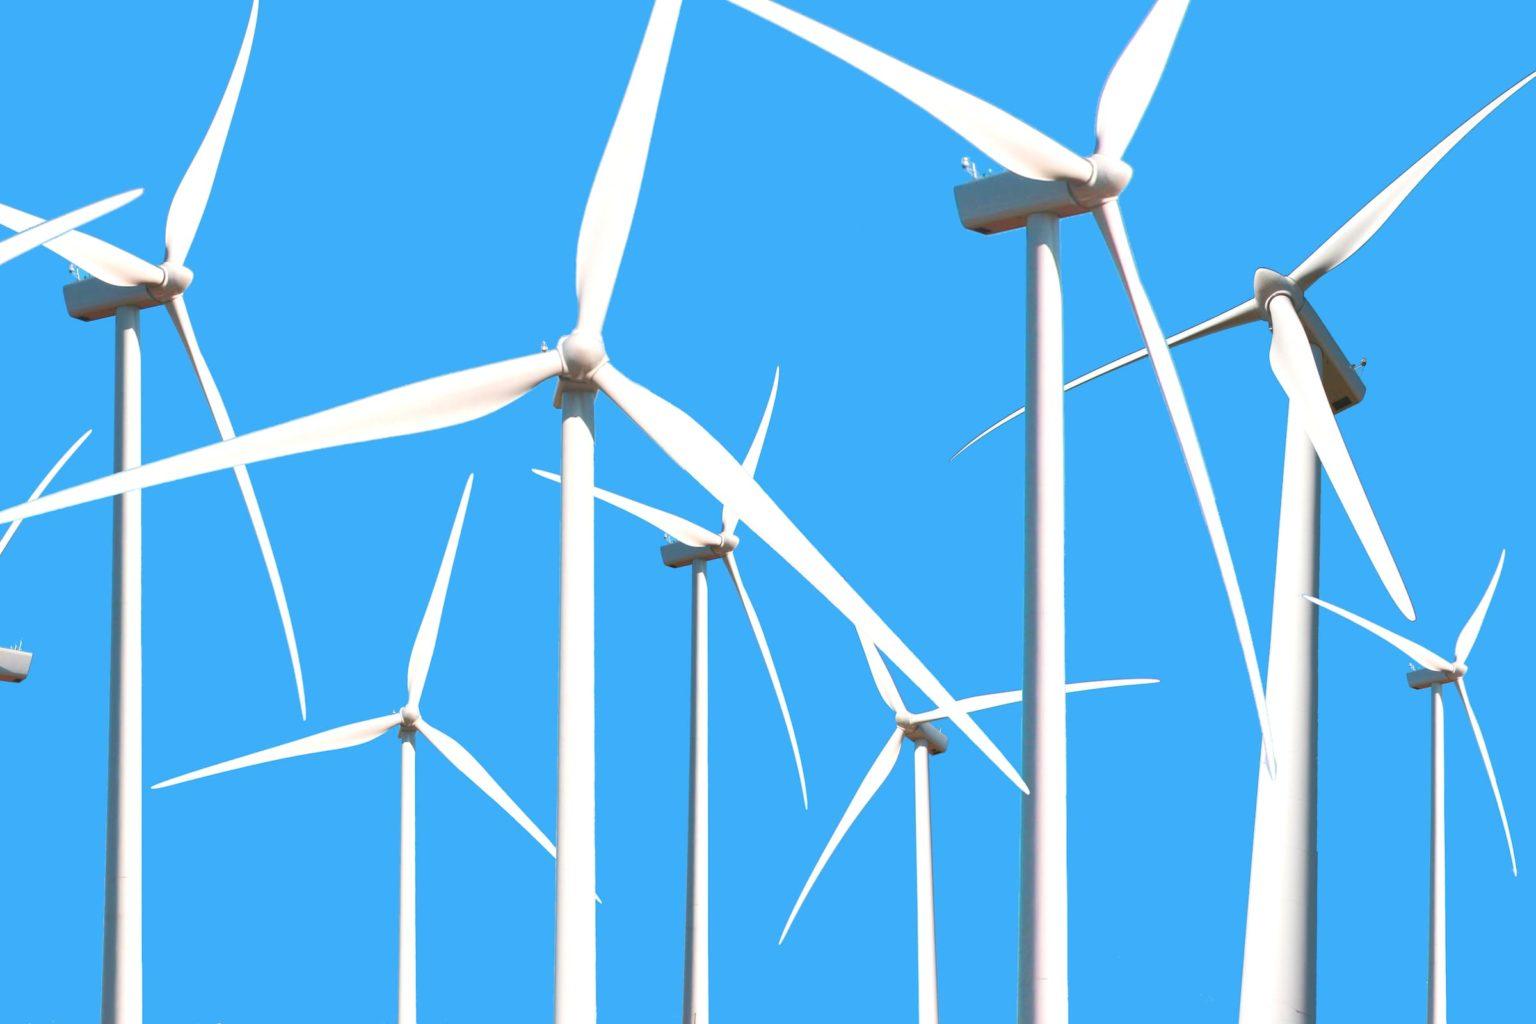 https://riftalliance.com/wp-content/uploads/2021/07/sector-energy-sustainability-1536x1024-1.jpg